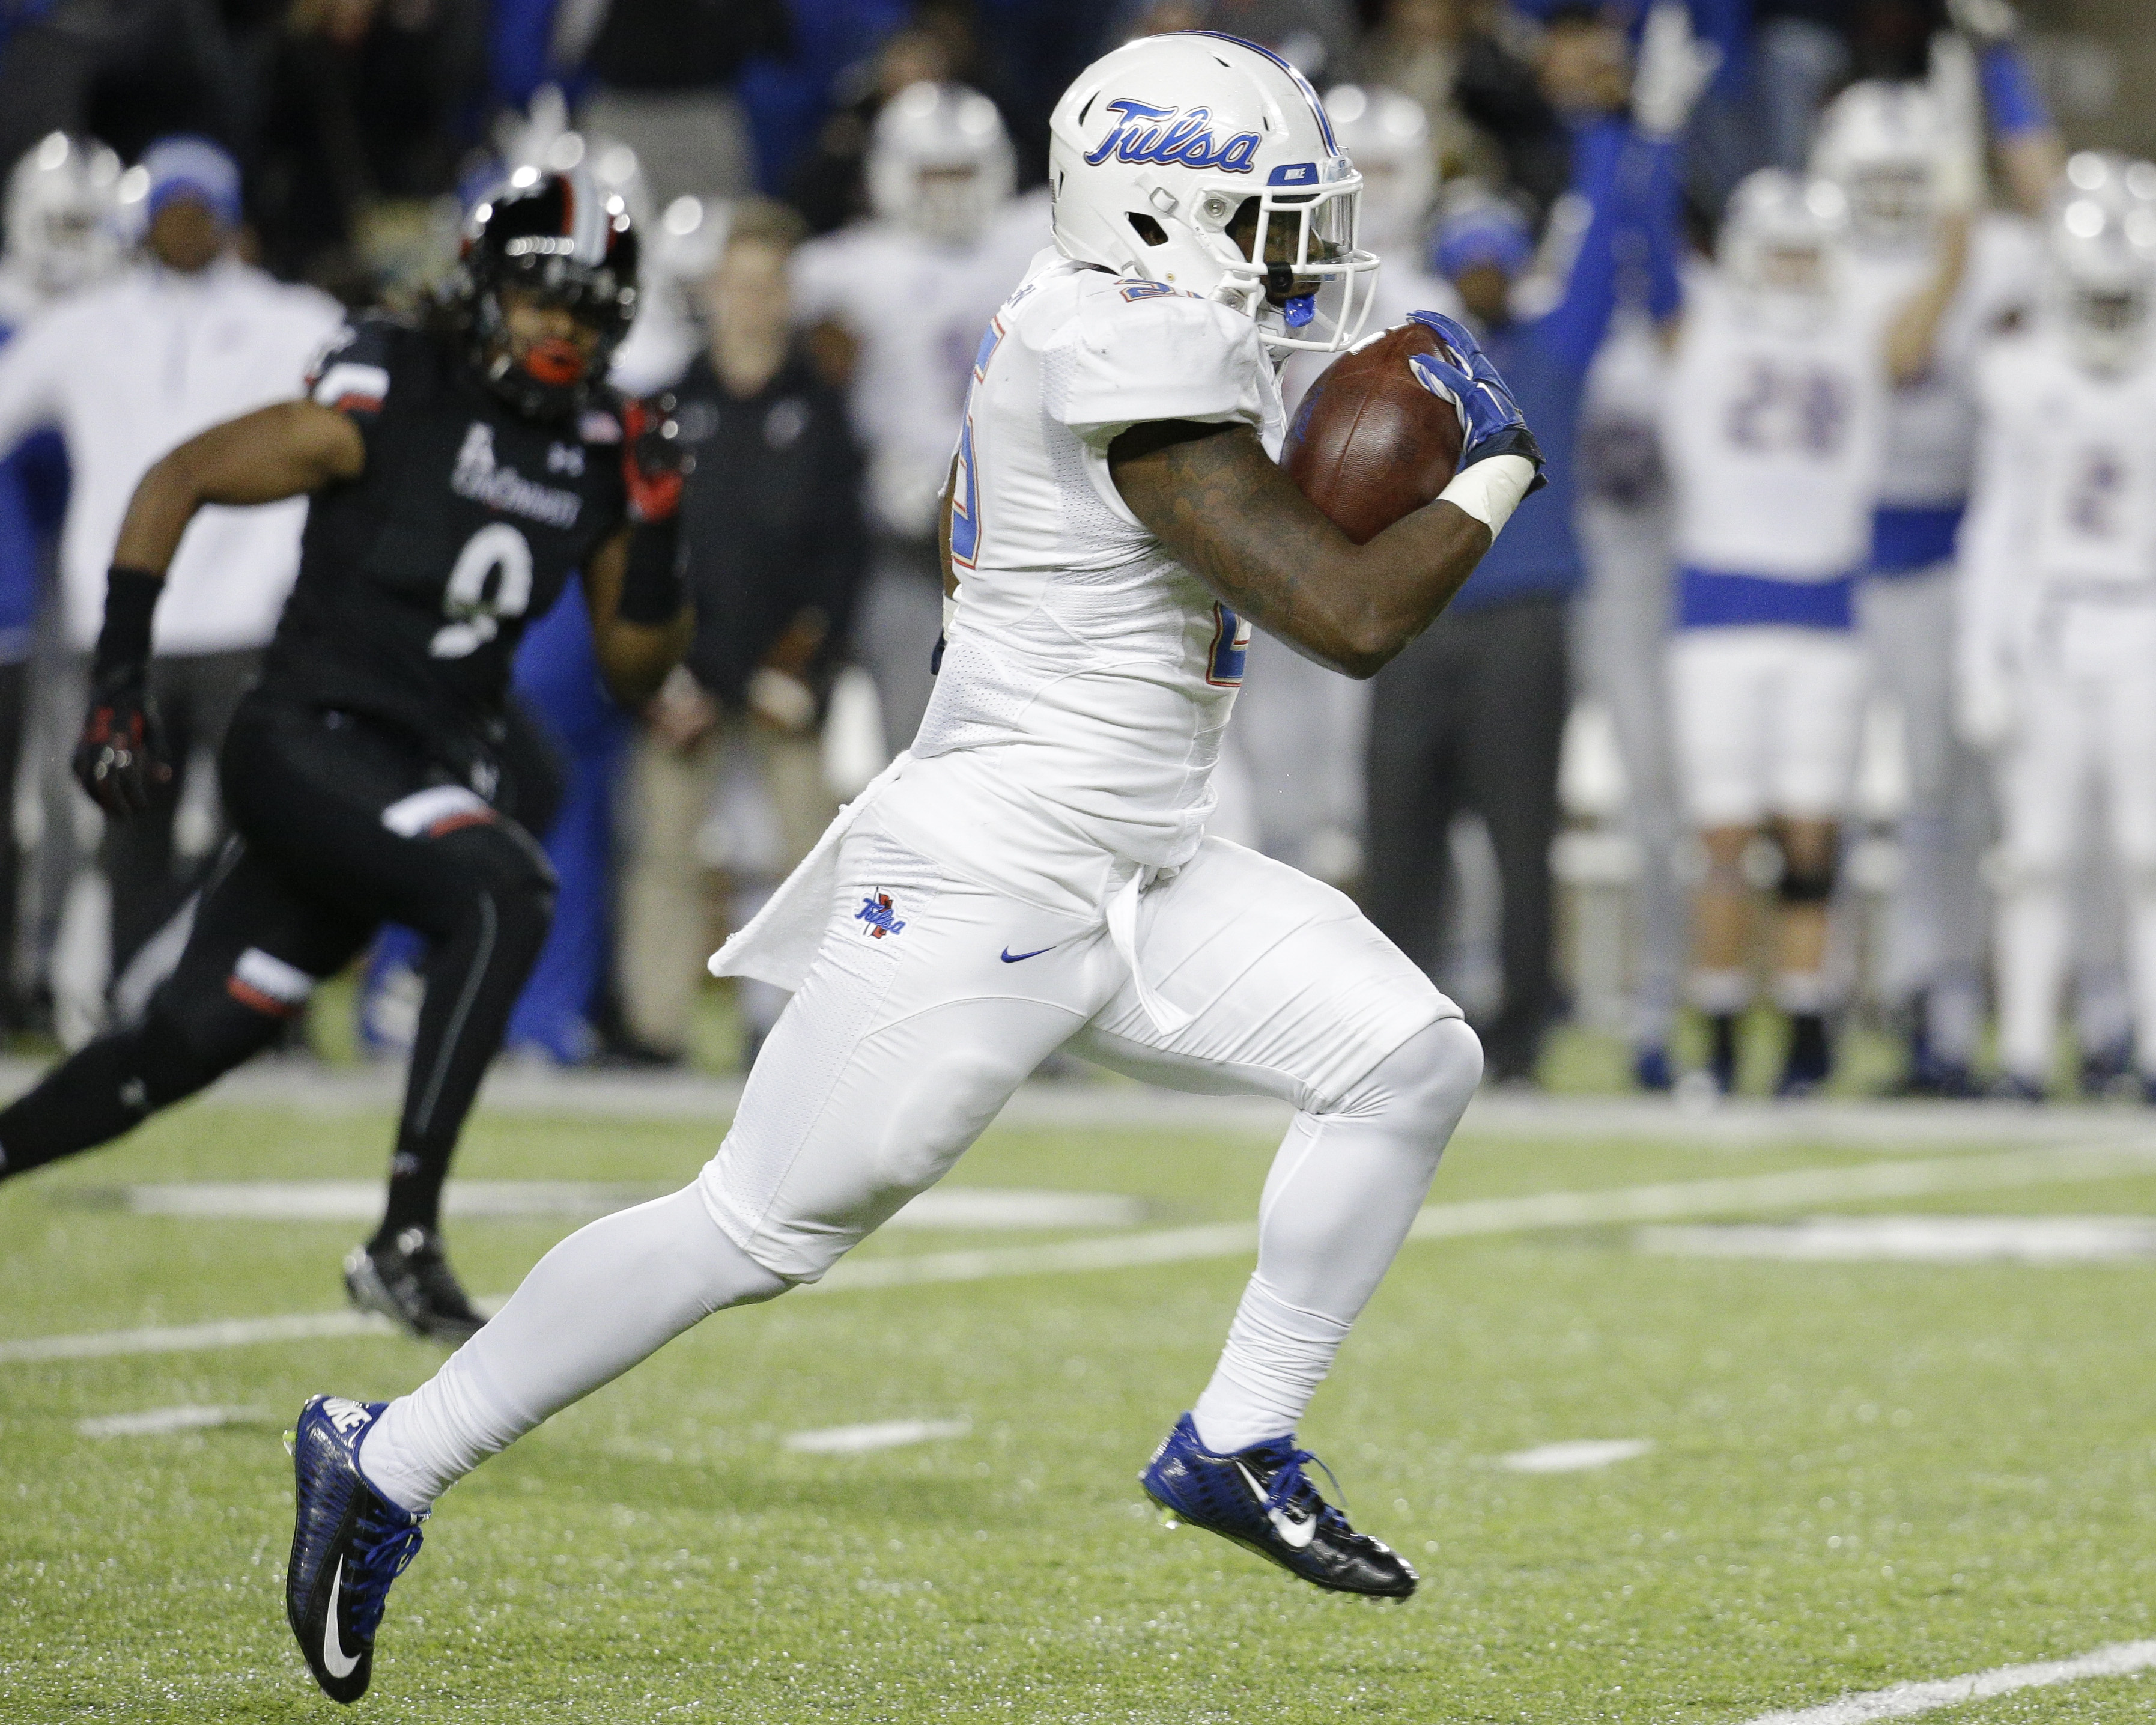 Tulsa running back Ramadi Warren runs for a touchdown in the second half of an NCAA college football game against Cincinnati, Saturday, Nov. 14, 2015, in Cincinnati. Cincinnati won 49-38. (AP Photo/John Minchillo)